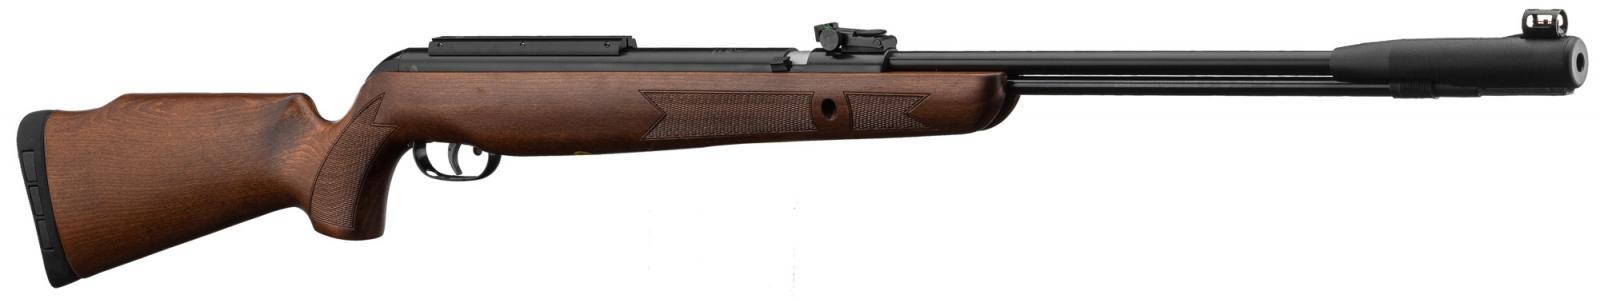 Carabine à air comprimé GAMO CFX Royal canon fixe 4.5 mm - 19.9 J